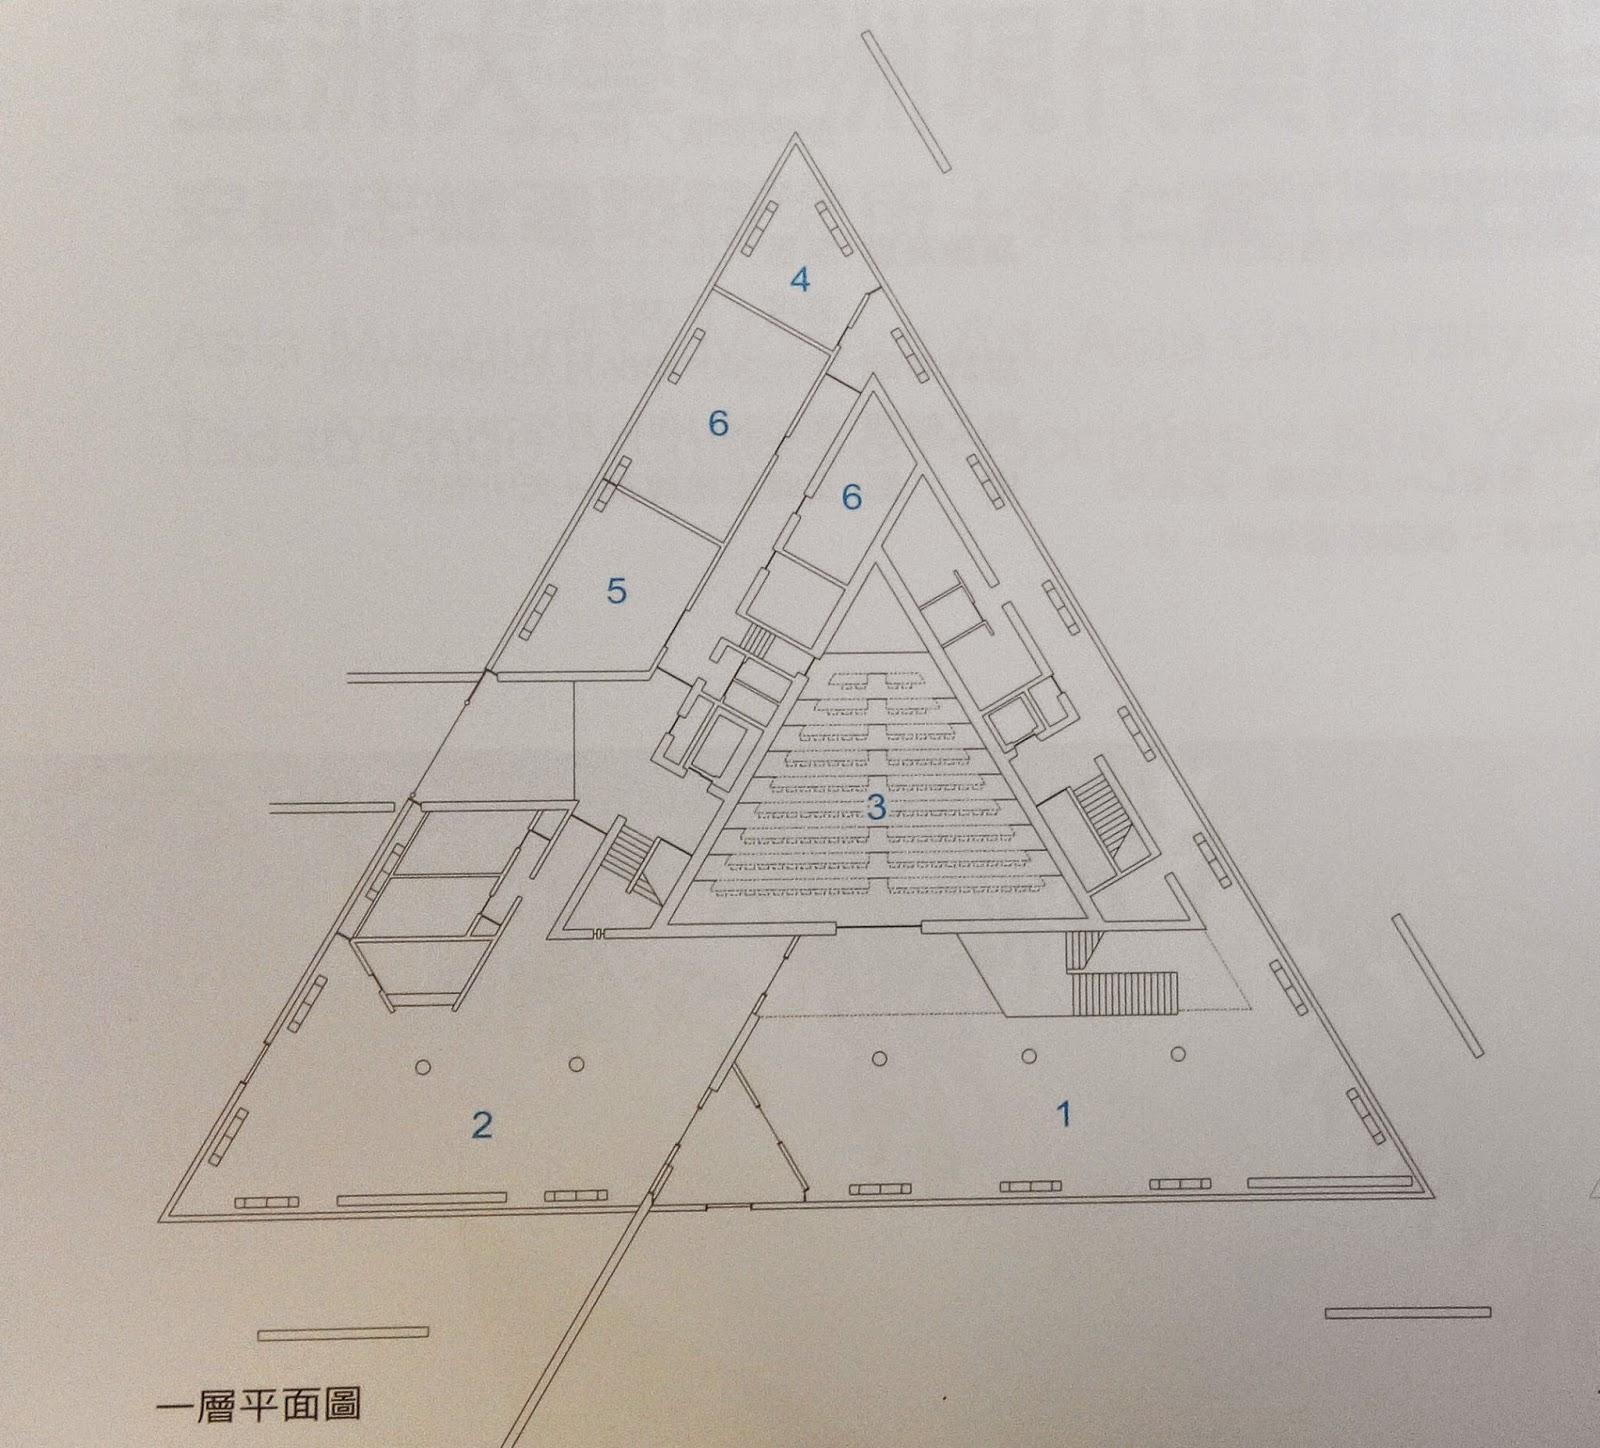 Triangular Floor Plan Arts Wise Photo Journal Taiwan 7 8 2014 Part 1